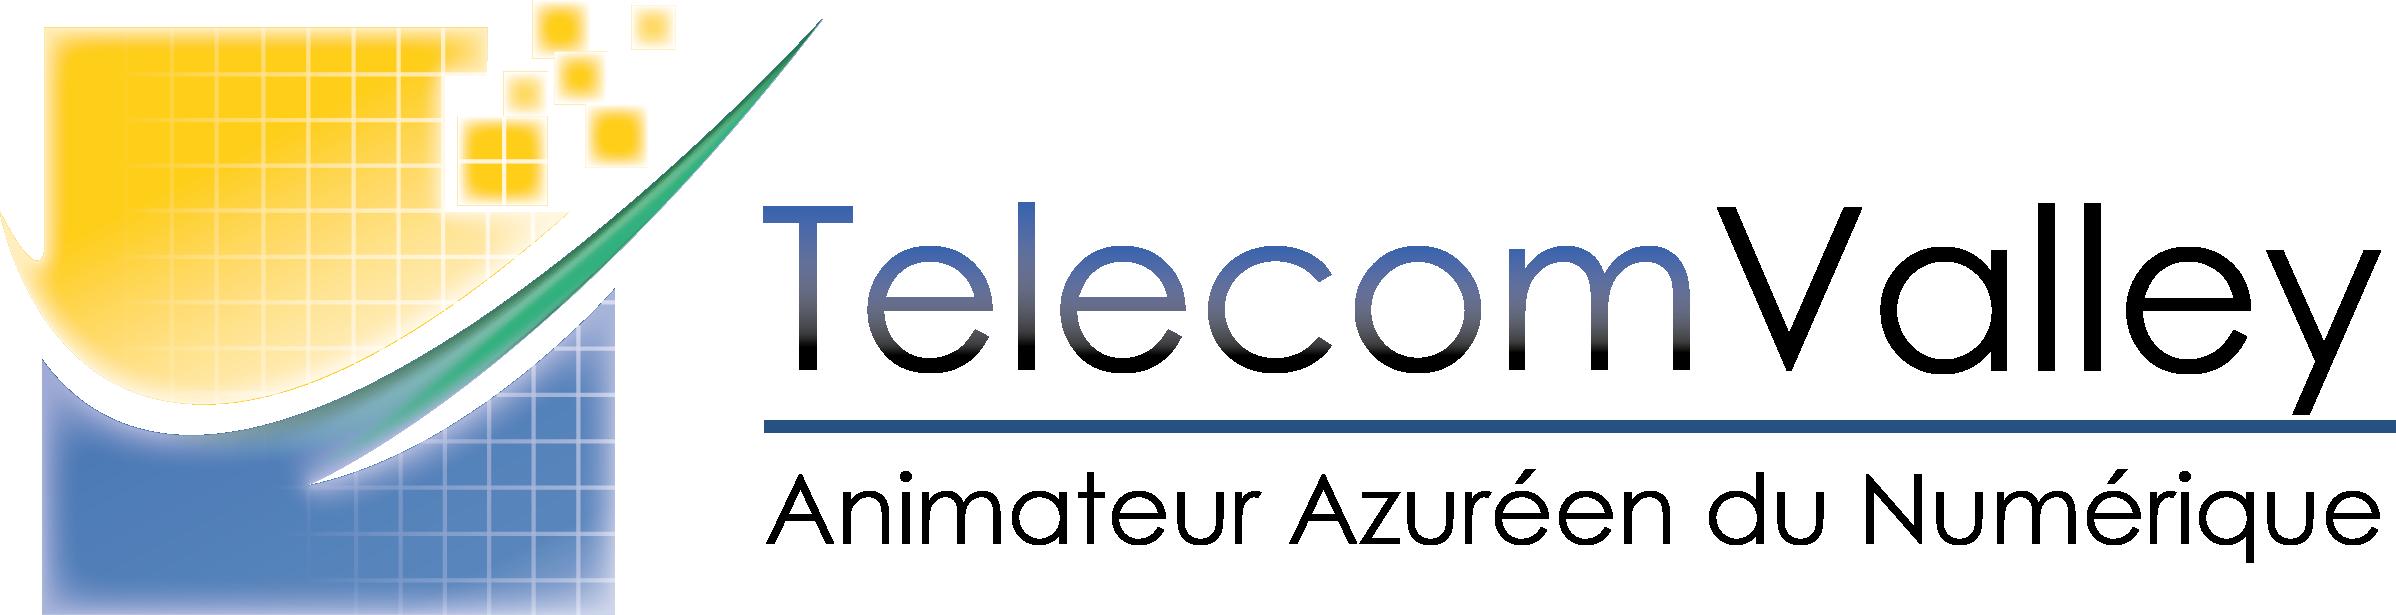 Telecom Valley présente sa gouvernance 2015-2017